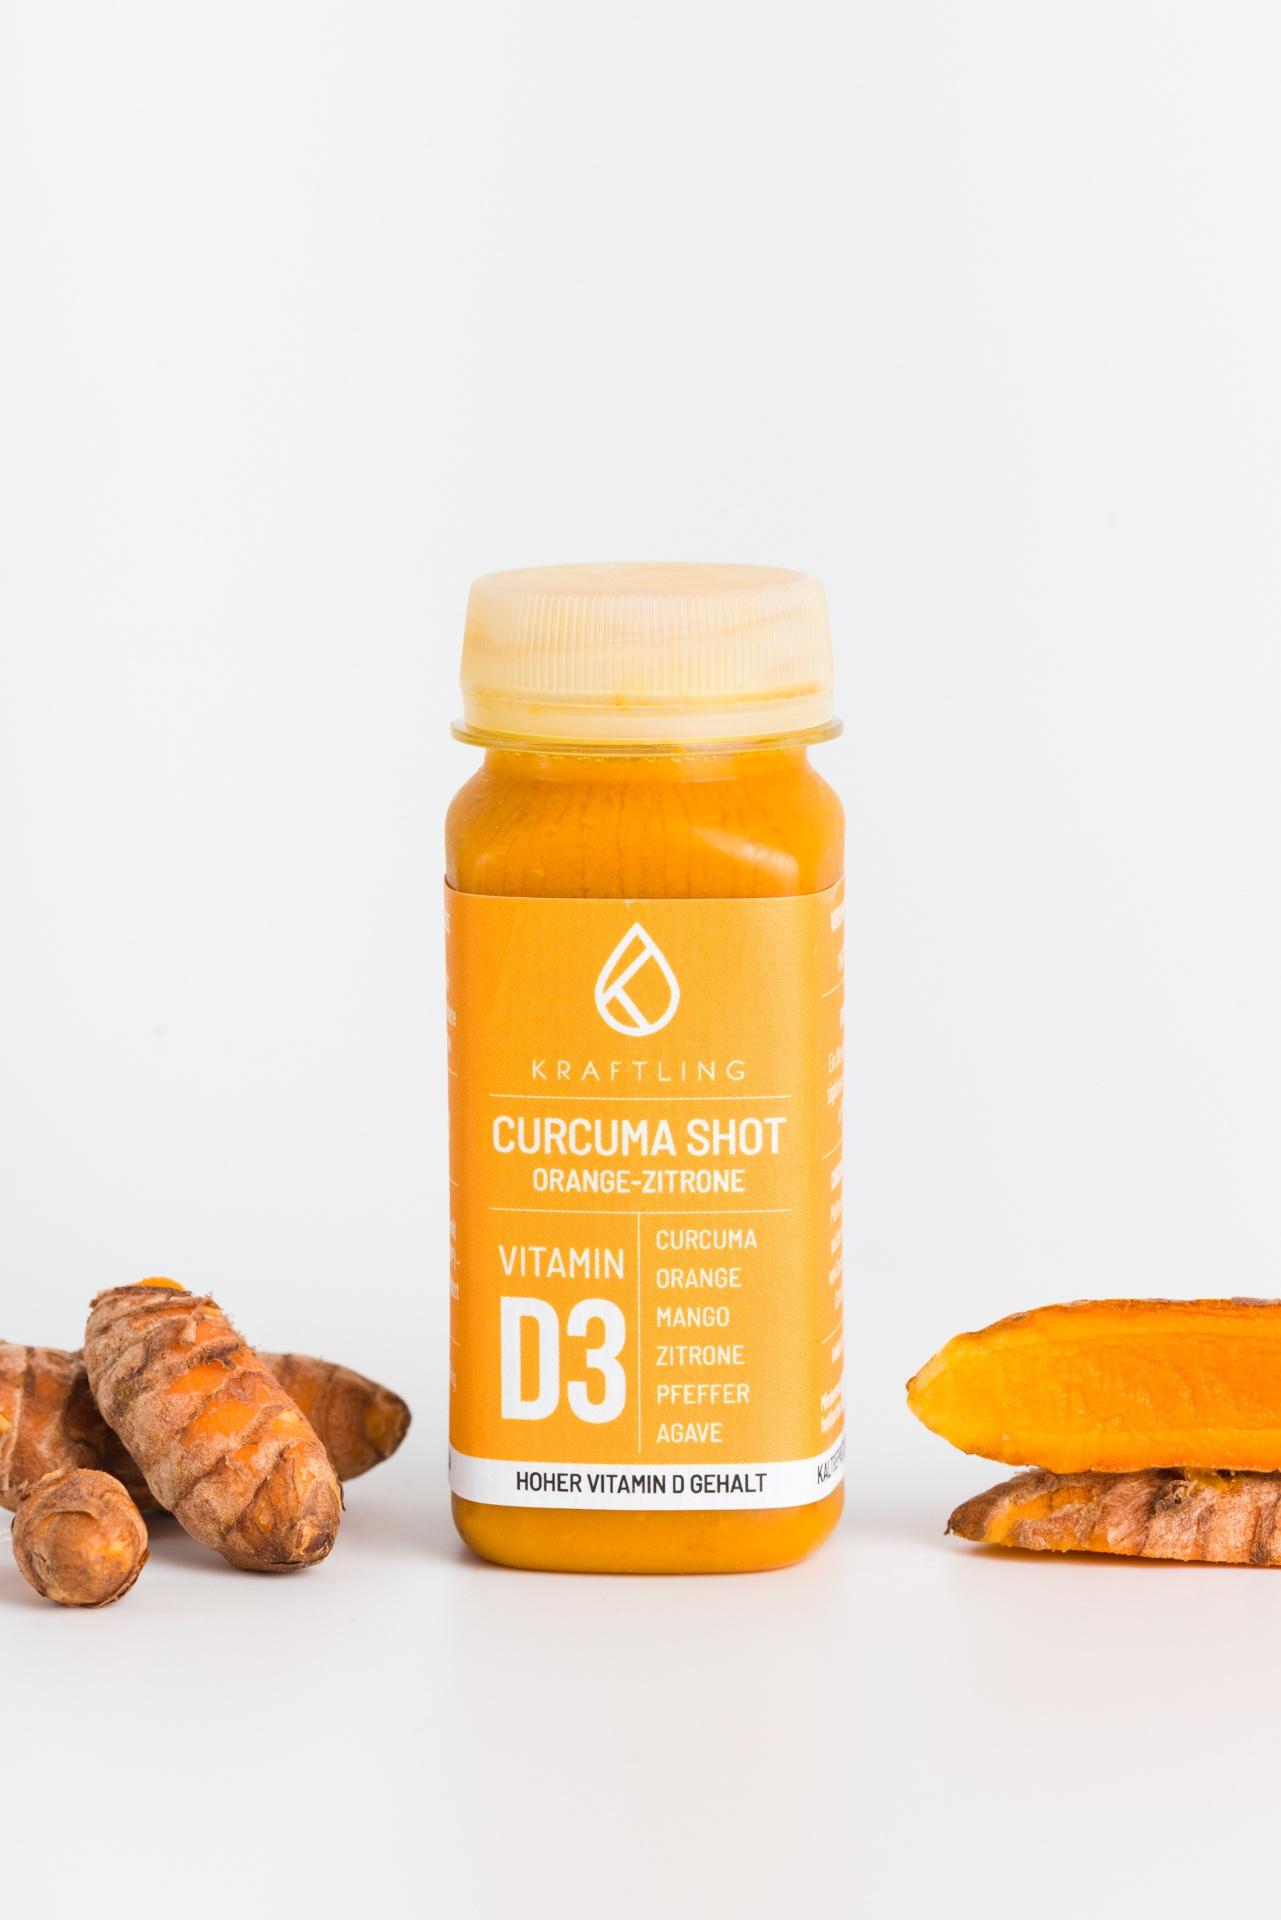 Curcuma shot Orange Zitrone Kraftling Produktbild 2